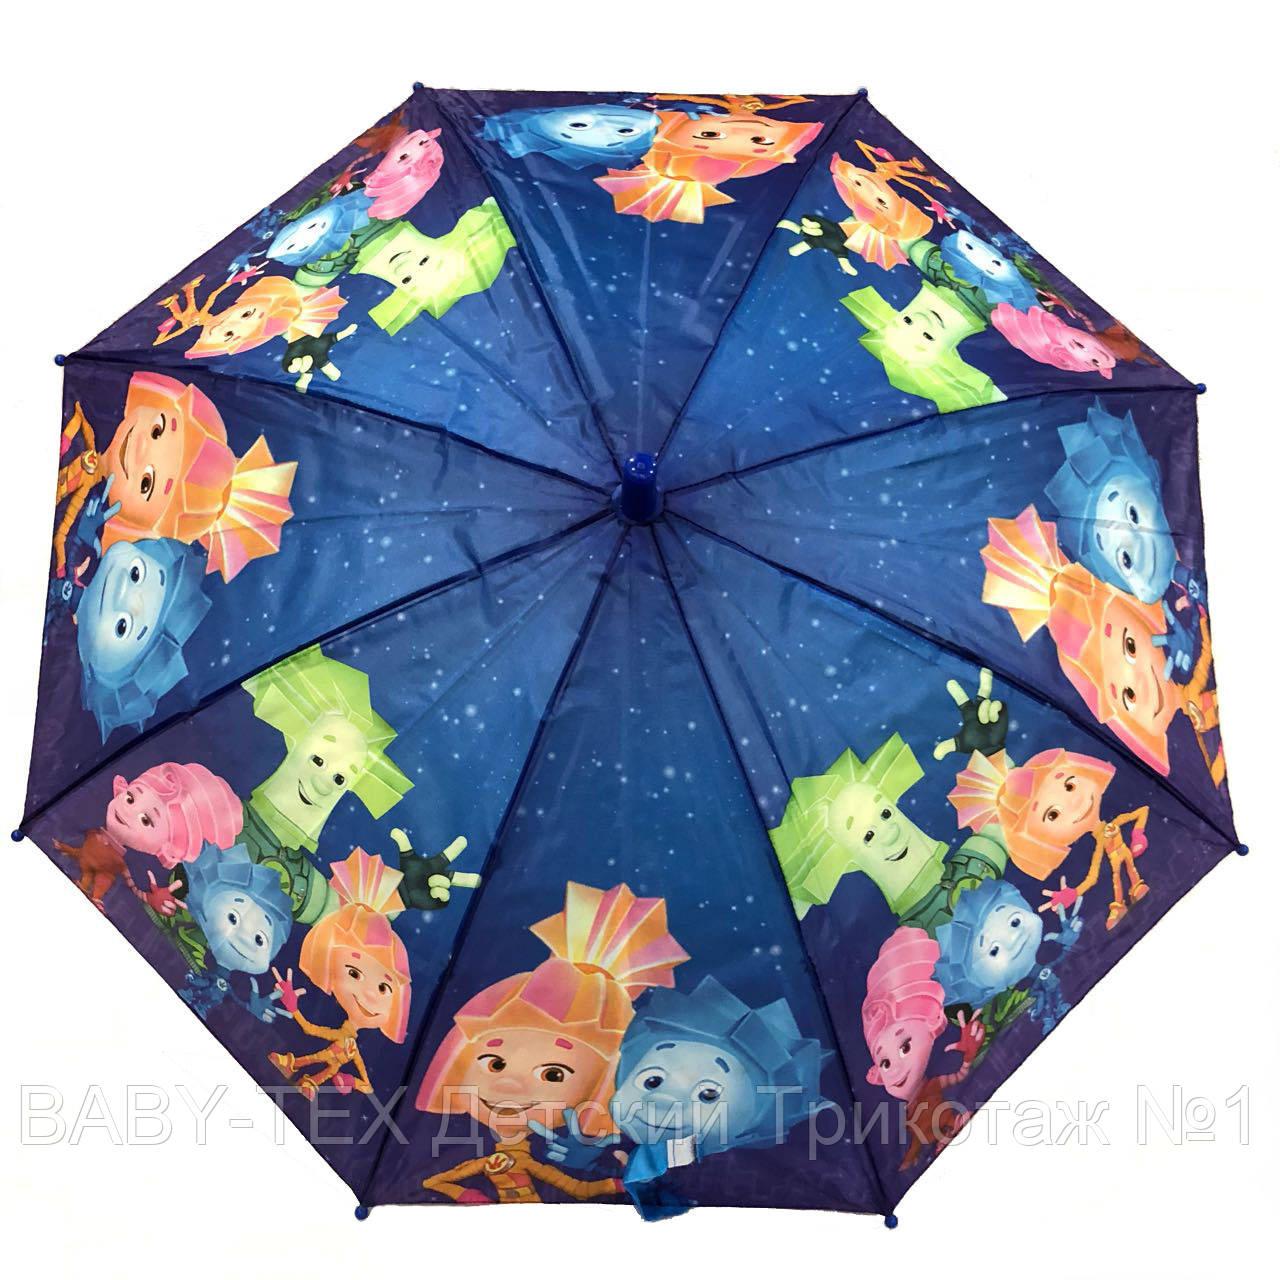 Зонты Фиксики на 3-6 лет.